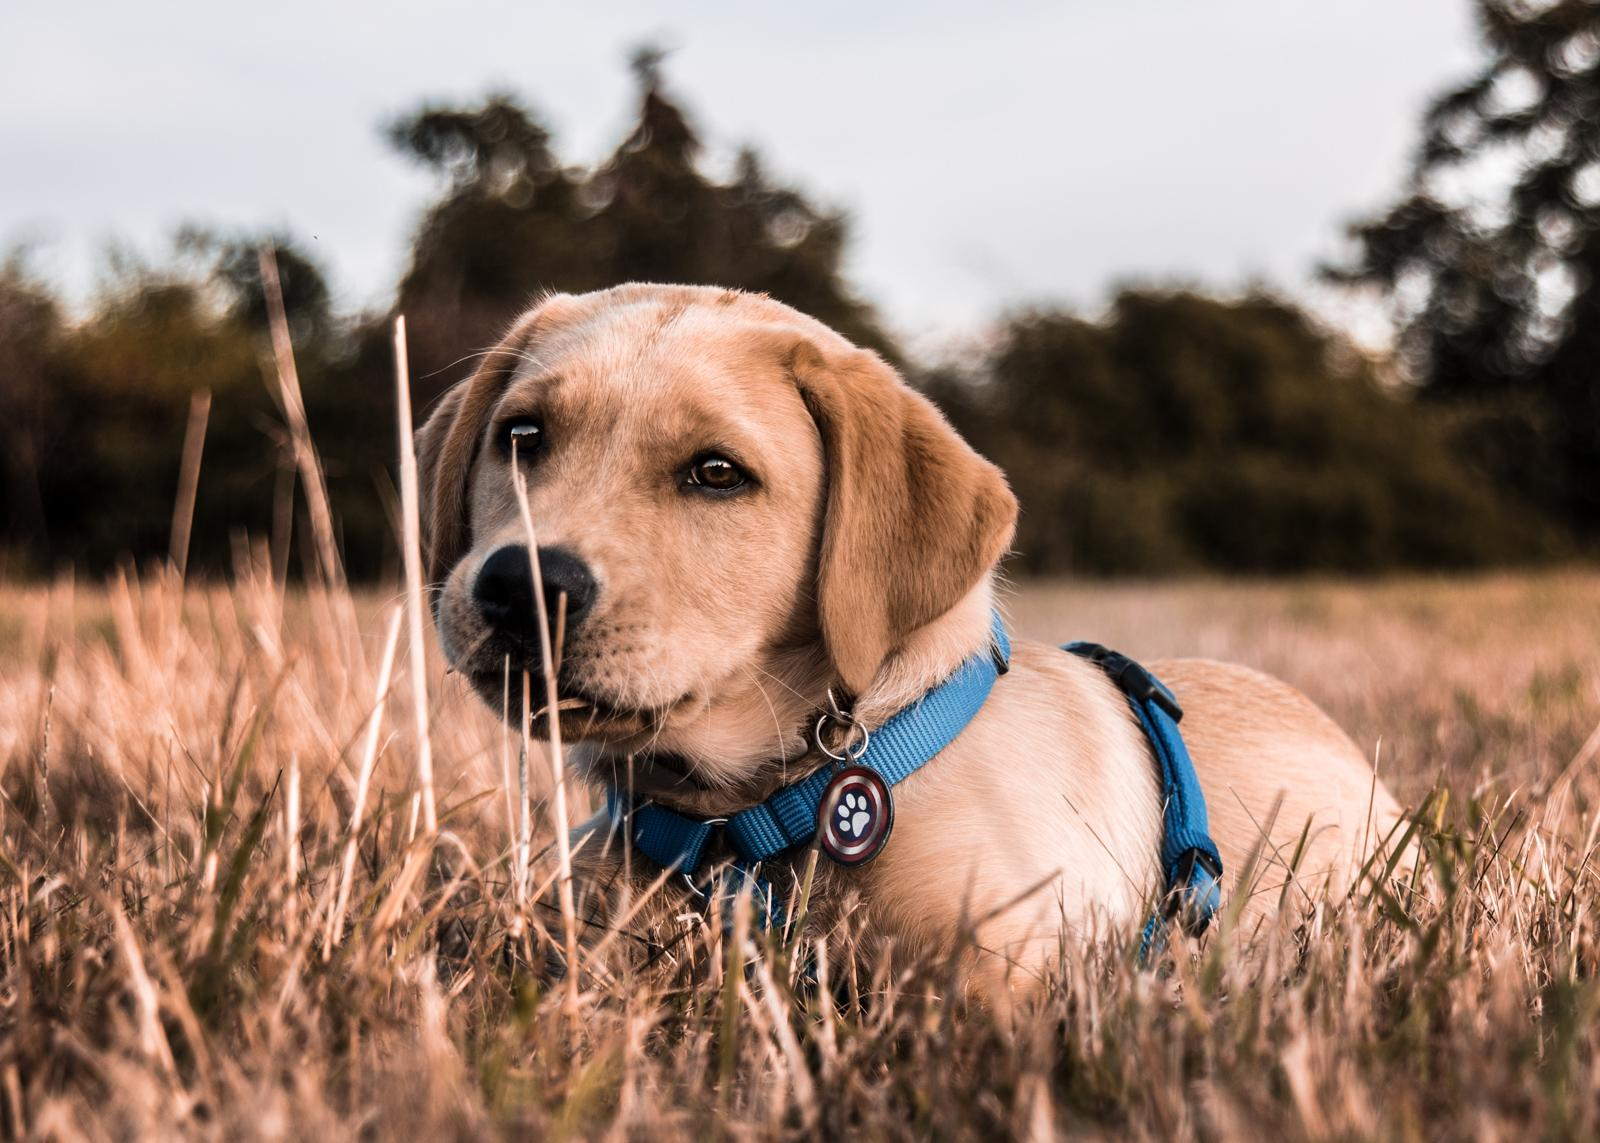 Tierfotograf-Labrador-Sven's Bildwerke-Hund-Hundefotografie14